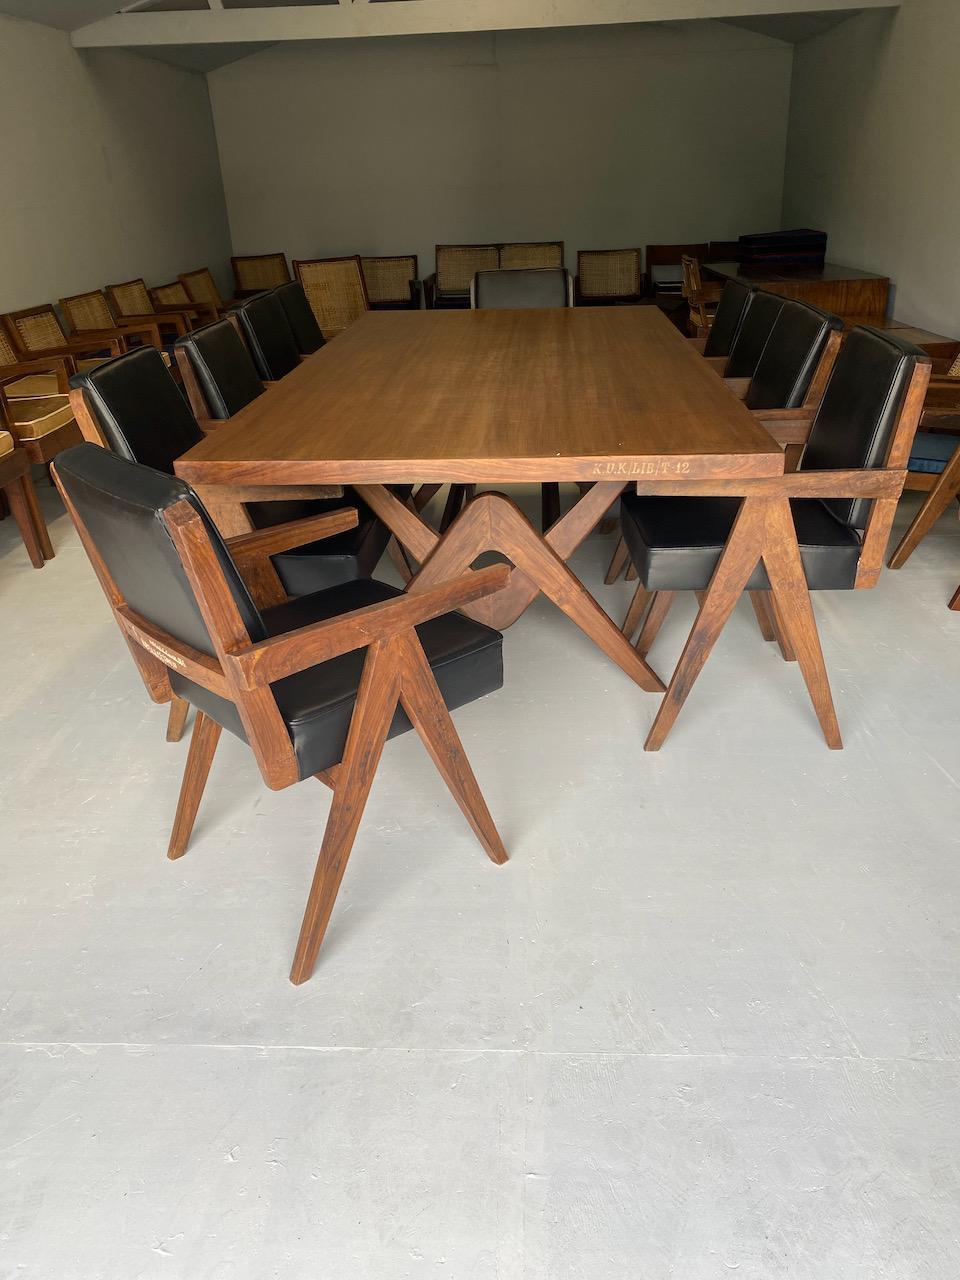 Pierre Jeanneret Dining Table & Ten Chairs Teak Chandigarh Circa 1960s